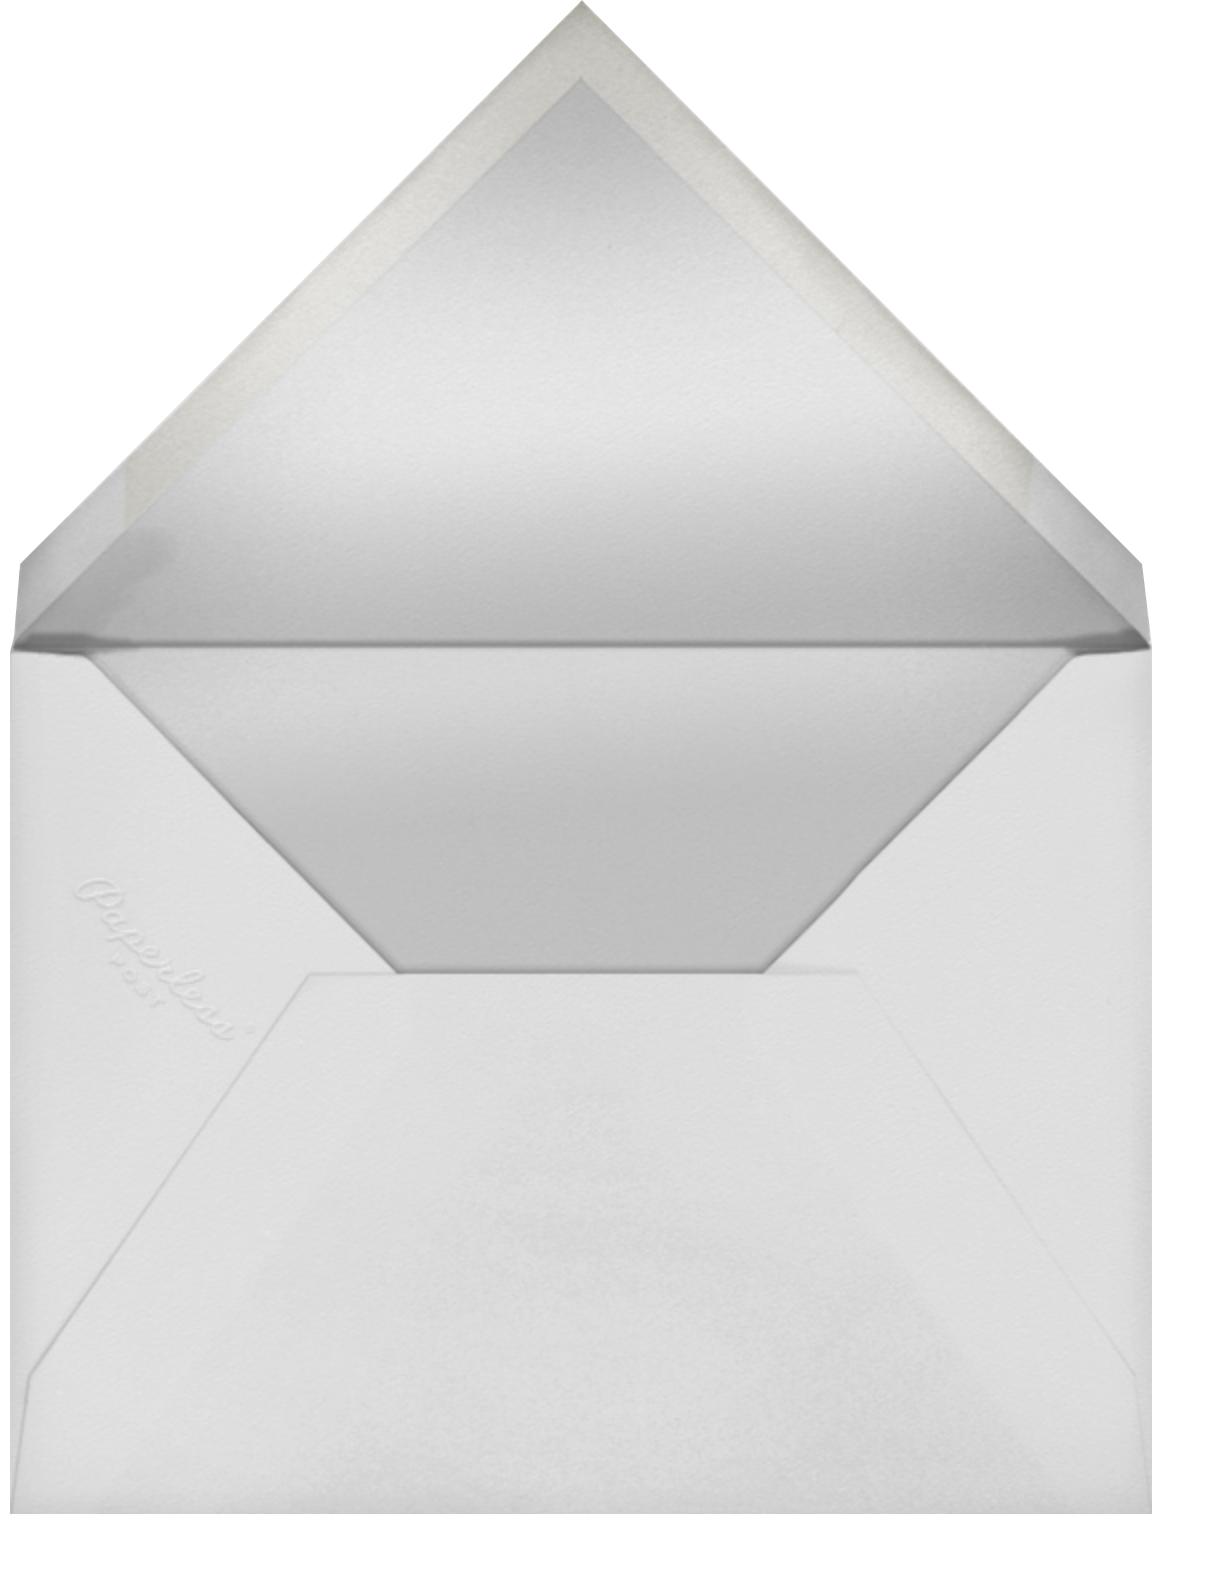 Mr. Chili Wills (Menu) - Mr. Boddington's Studio - Menus - envelope back